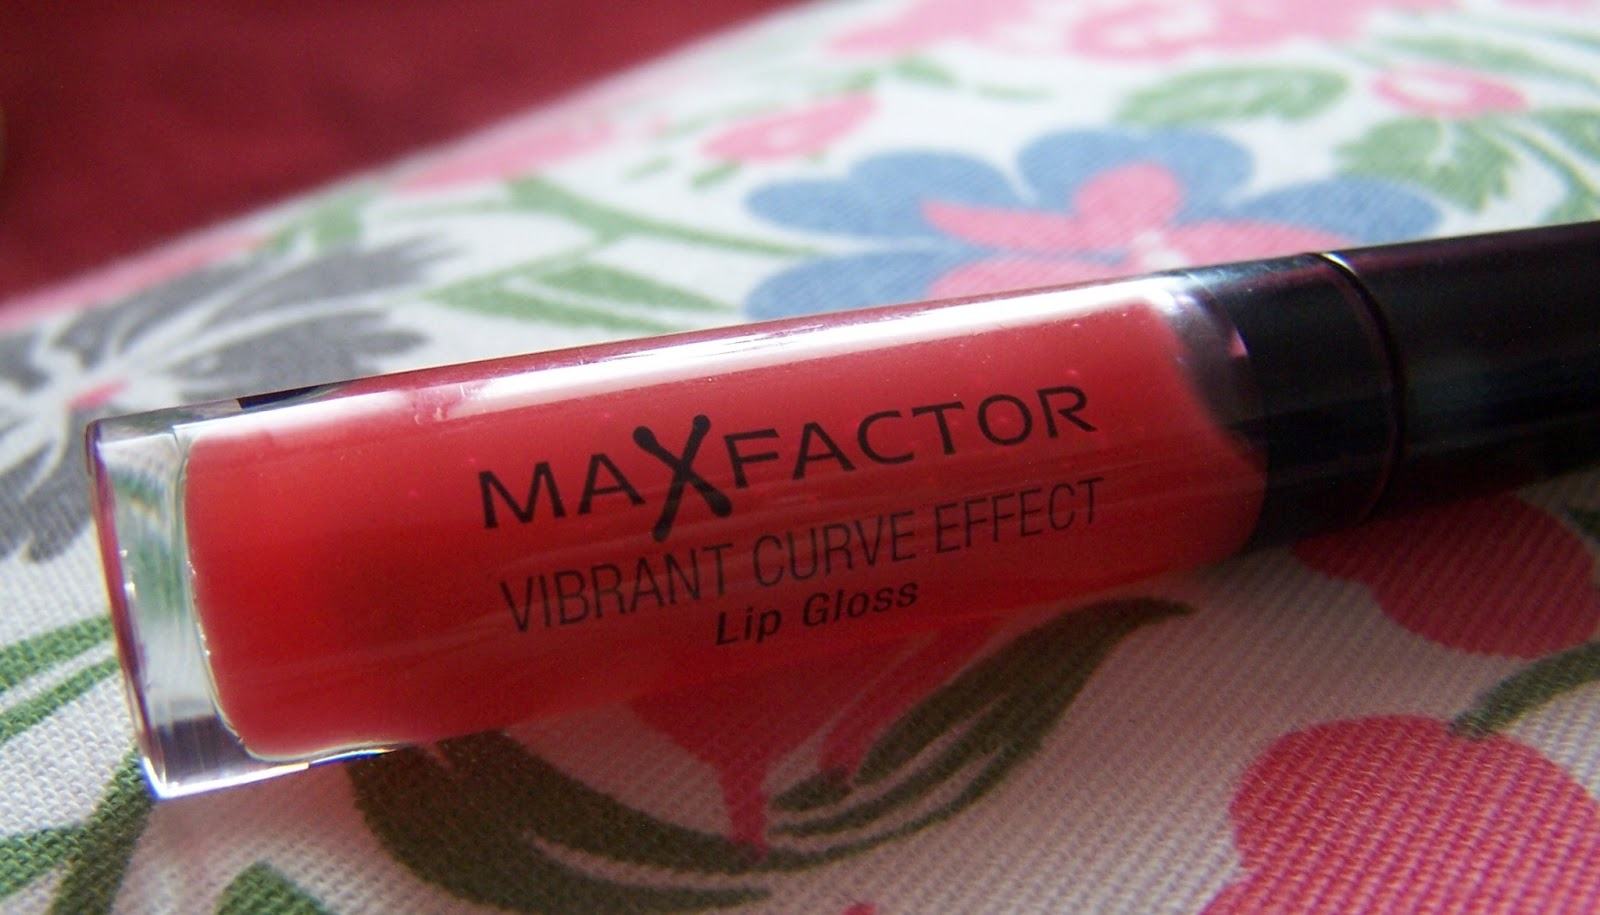 Max Factor Vibrant Curve Effect